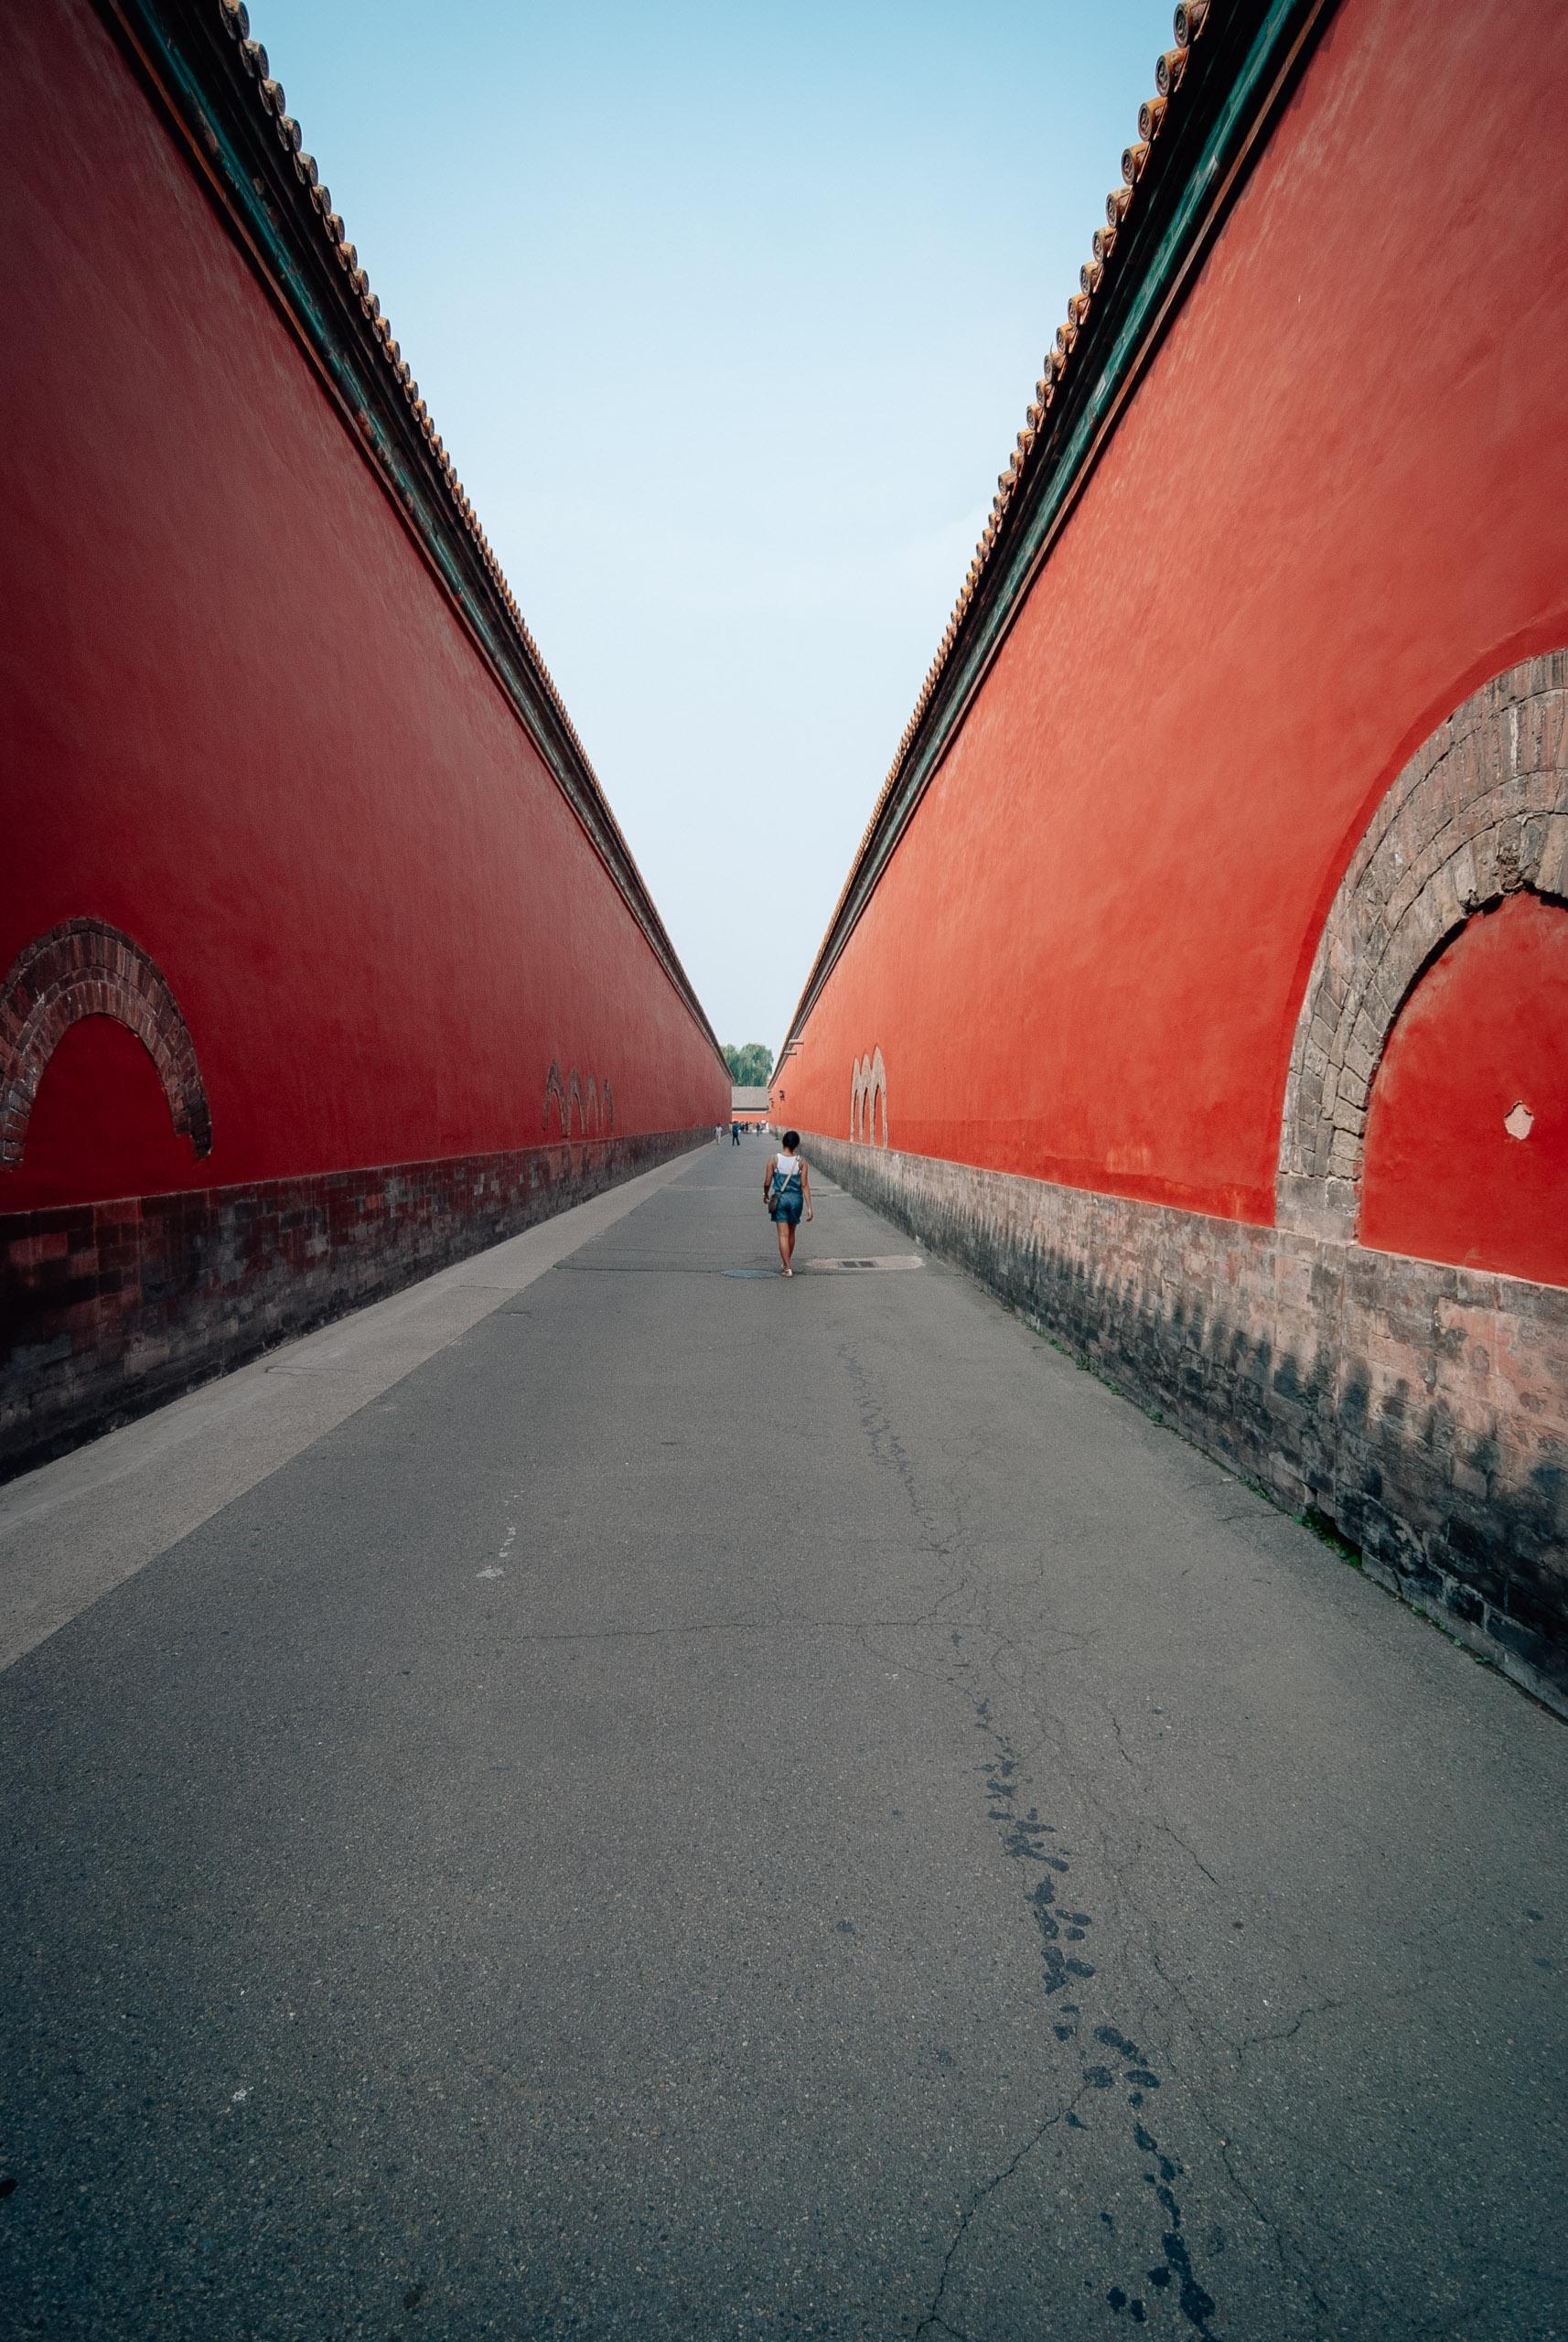 China - Beijing & The Great Wall - 2010-0903-DSC_0354_59535